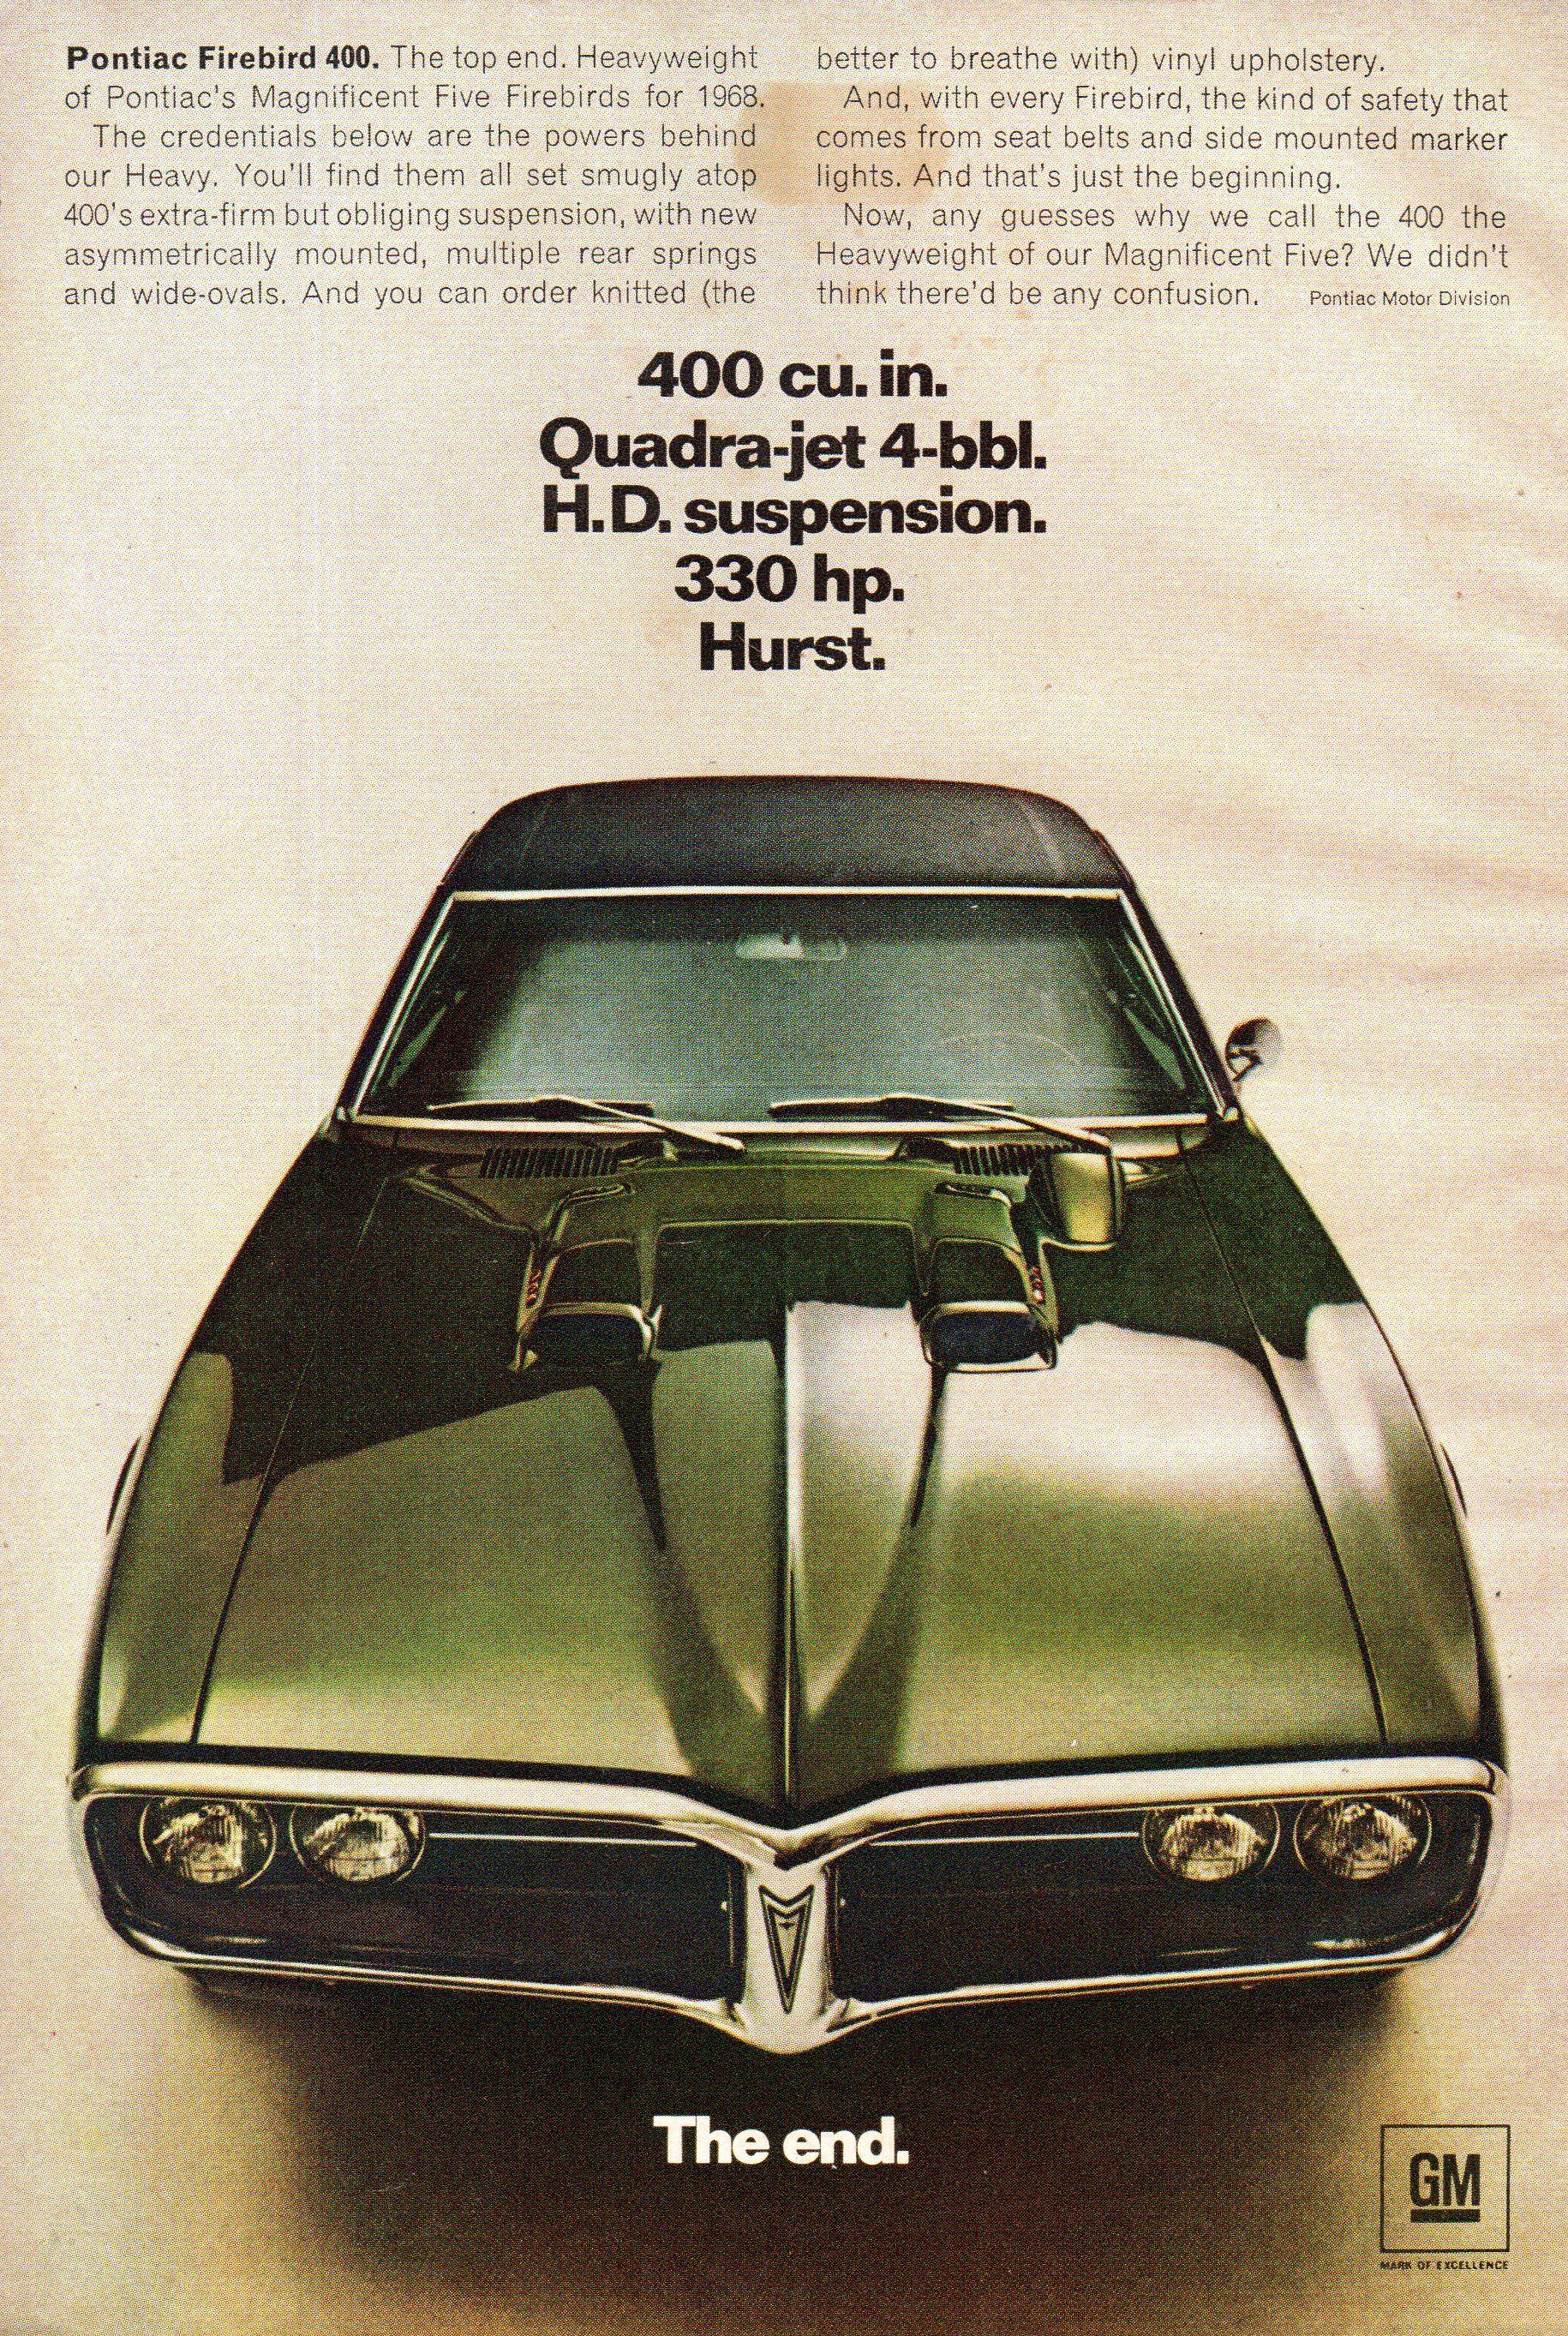 1968 Pontiac Firebird 400 Sport Coupe USA Original Magazine Advertisement